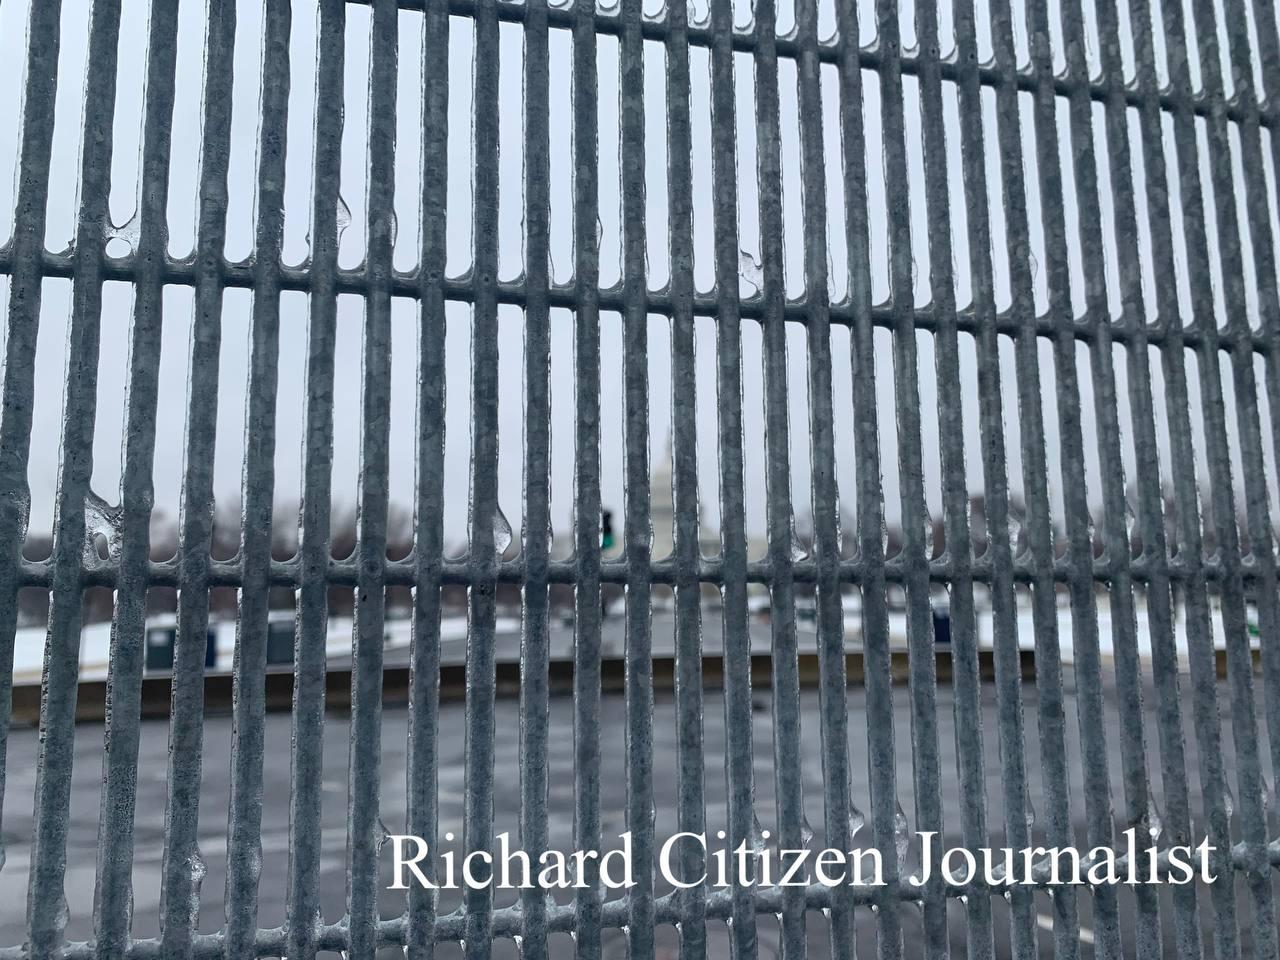 White House behind bars